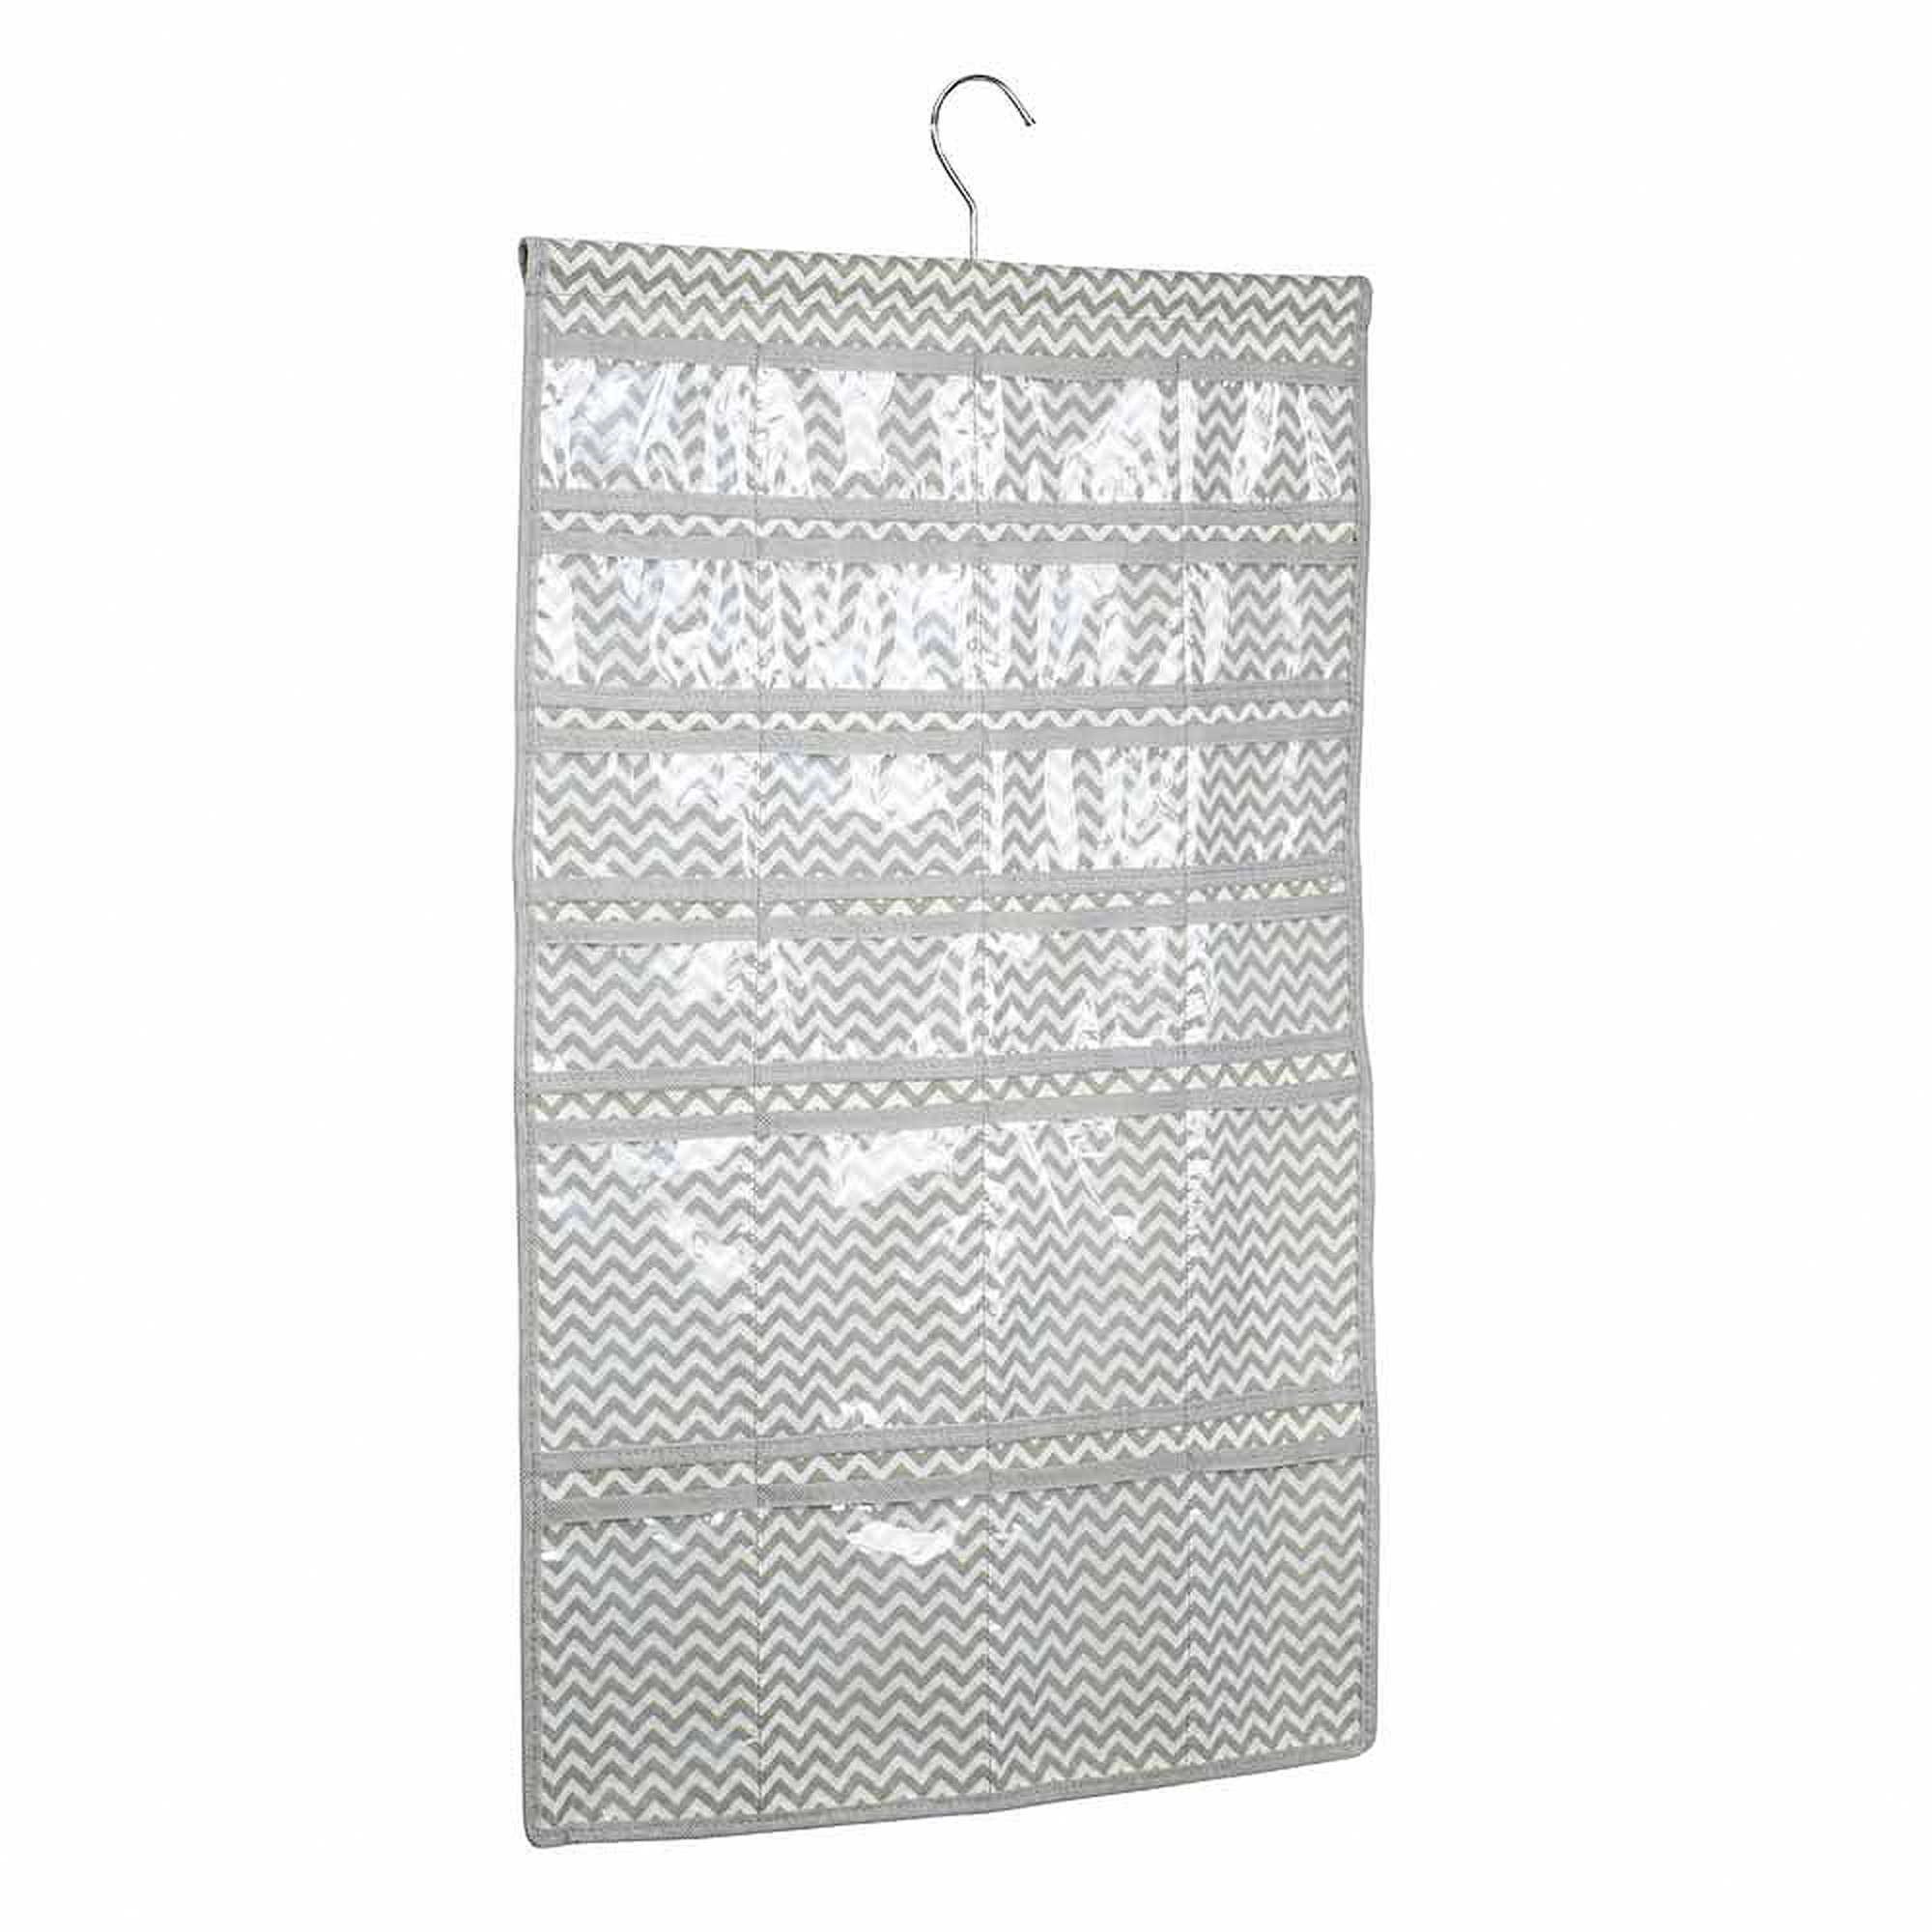 InterDesign Chevron Fabric Hanging Fashion Jewelry Organizer for